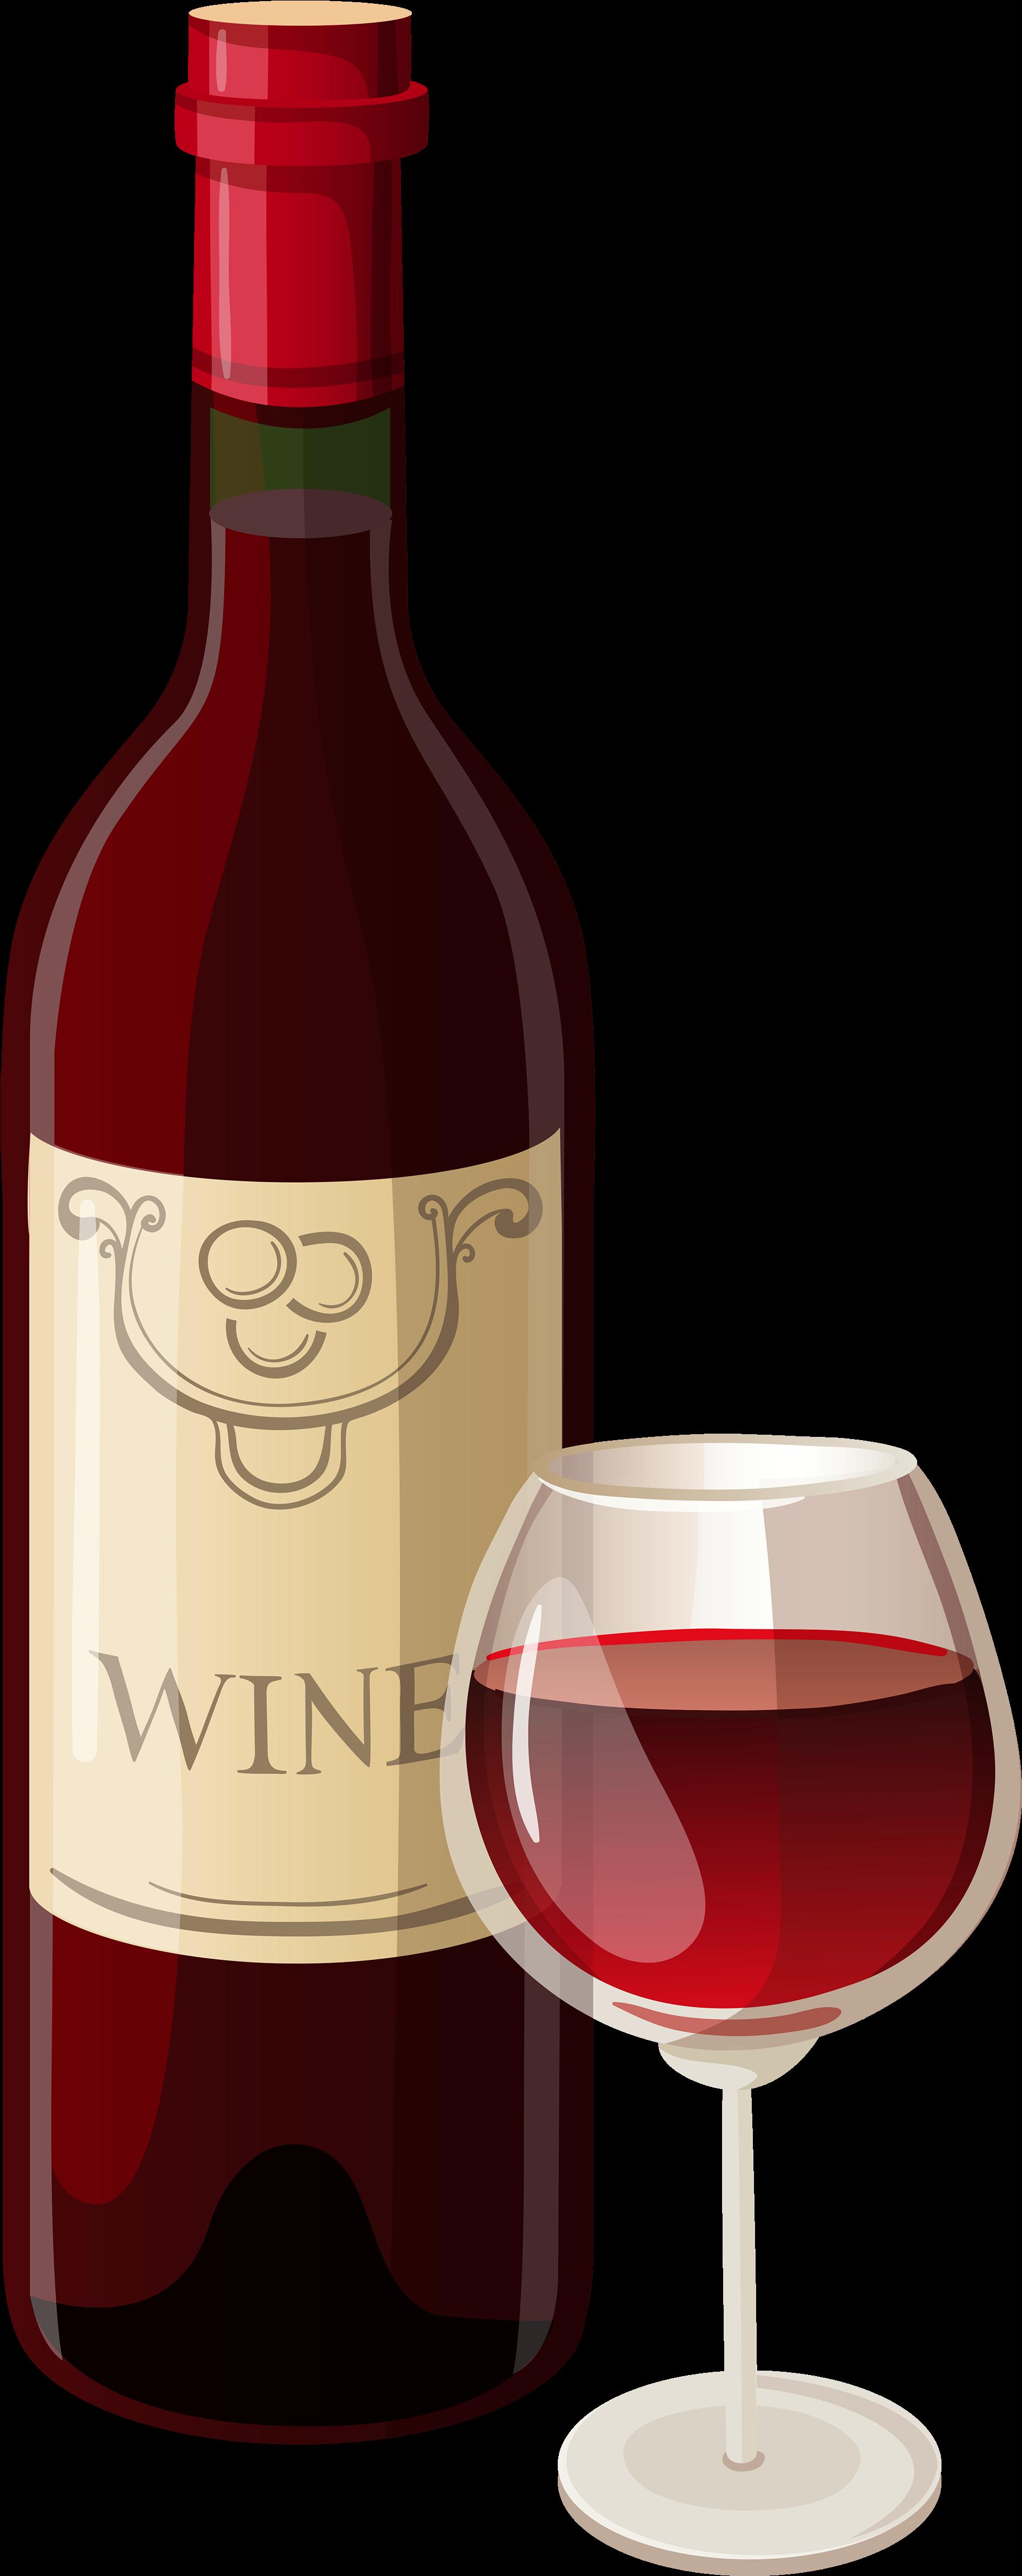 Red Wine Champagne Bottle Clip art.